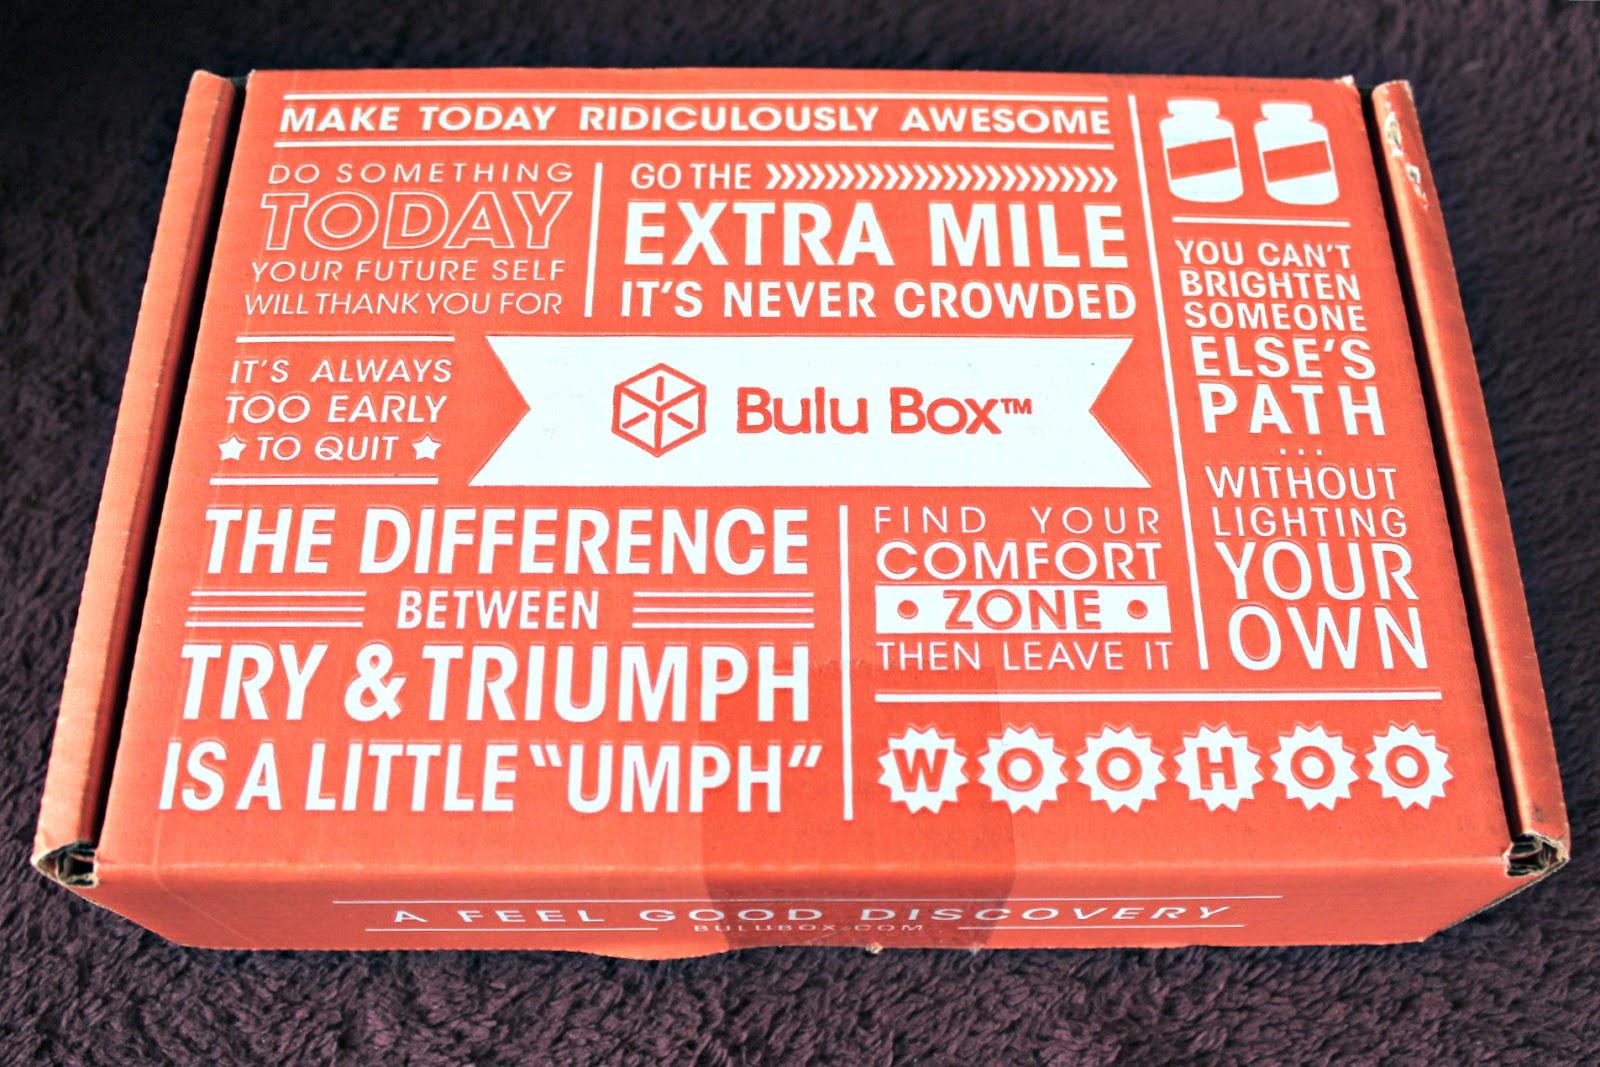 Bulu Box Review May 2014 50 Off Code Weight Loss Box